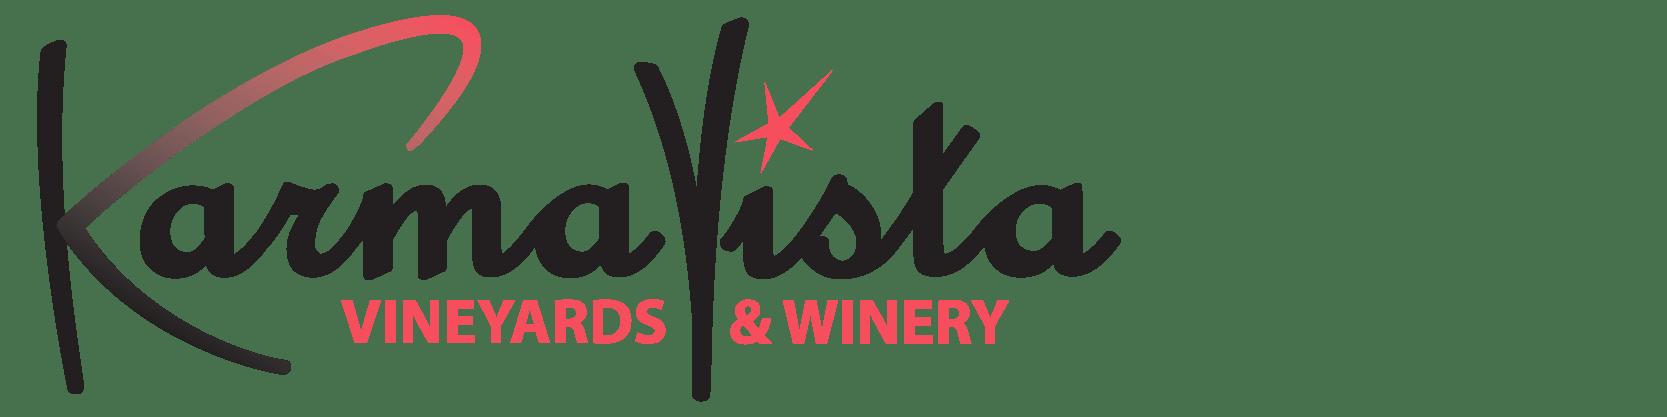 Karma Vista Vineyards and Winery